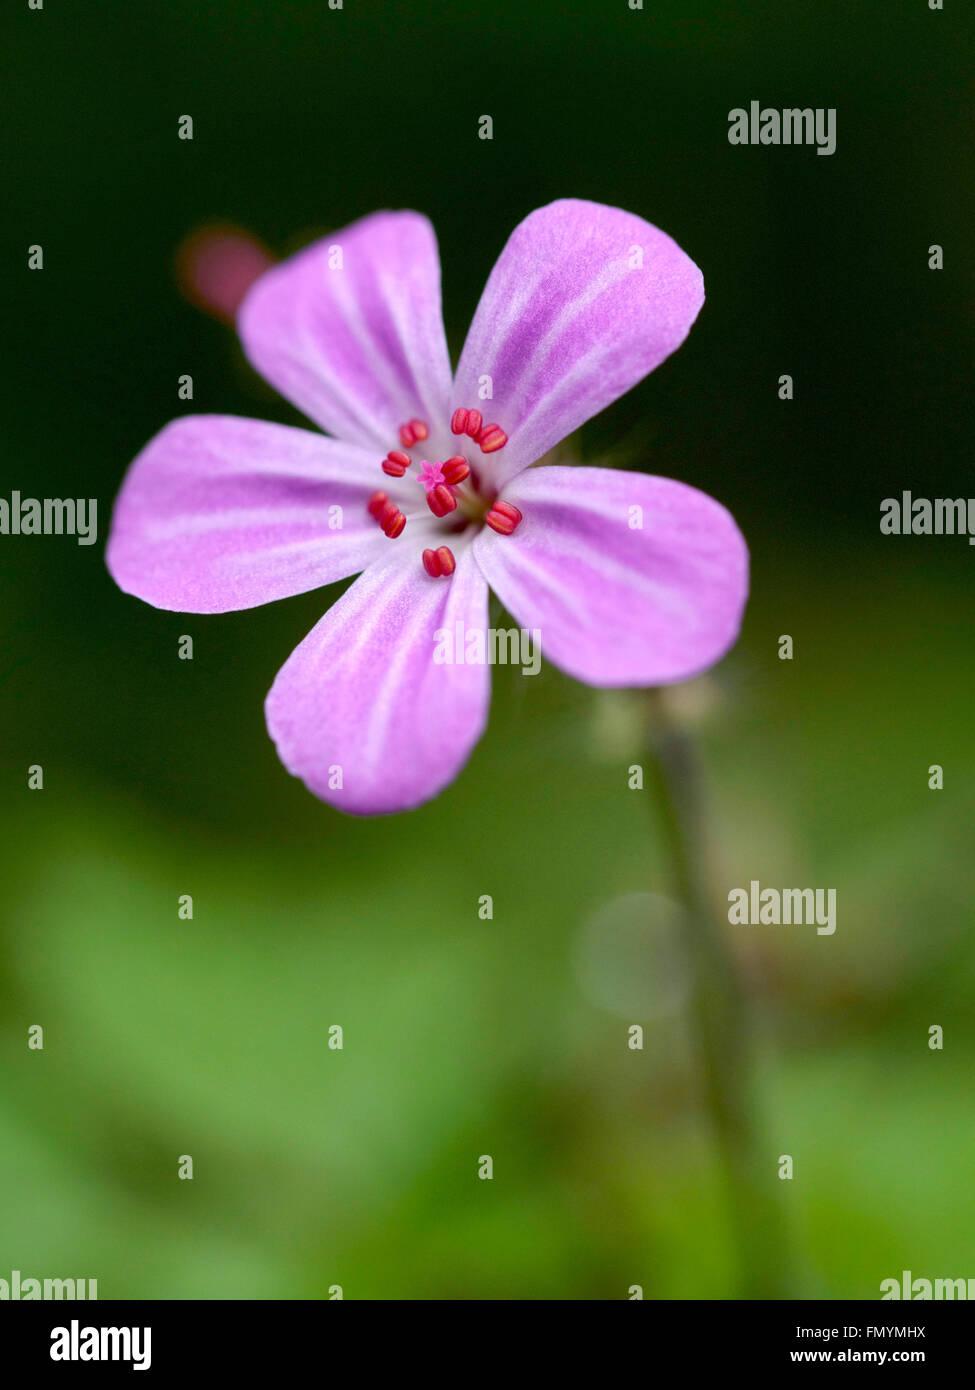 Geranium robertianum,  Herb-Robert, flower - Stock Image